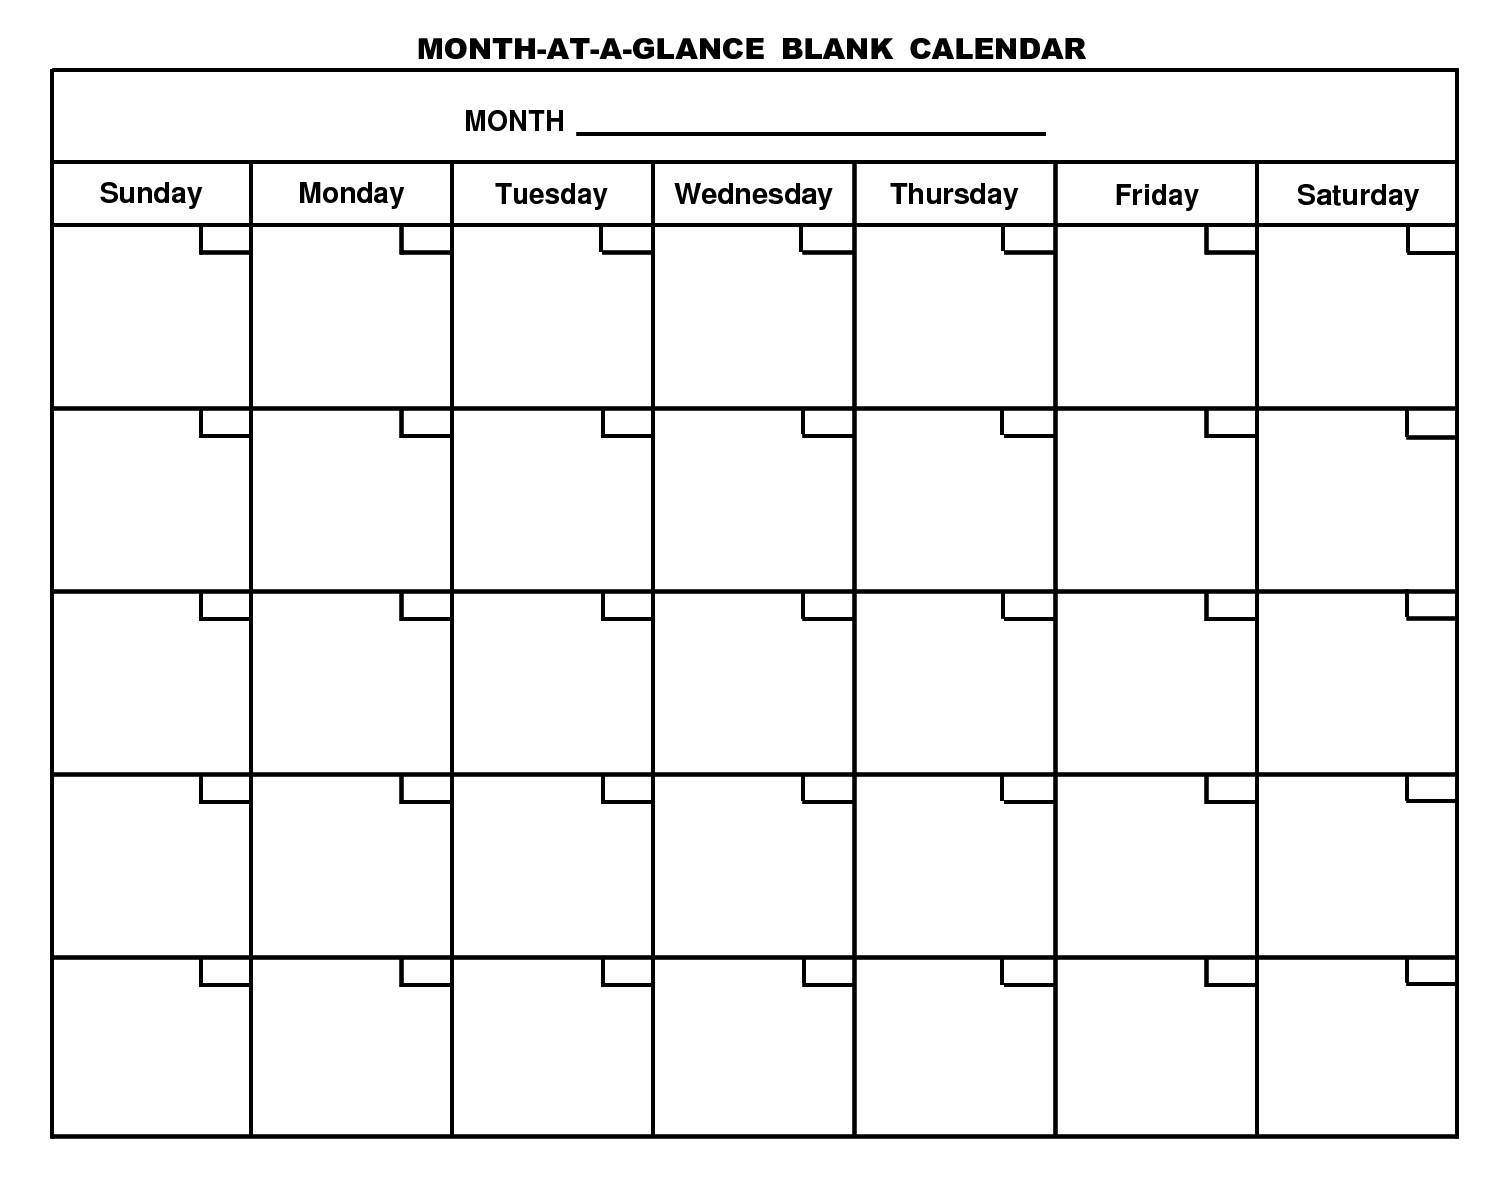 Blank Calendar By Month 2015 – Printable Editable Blank Calendar 2017